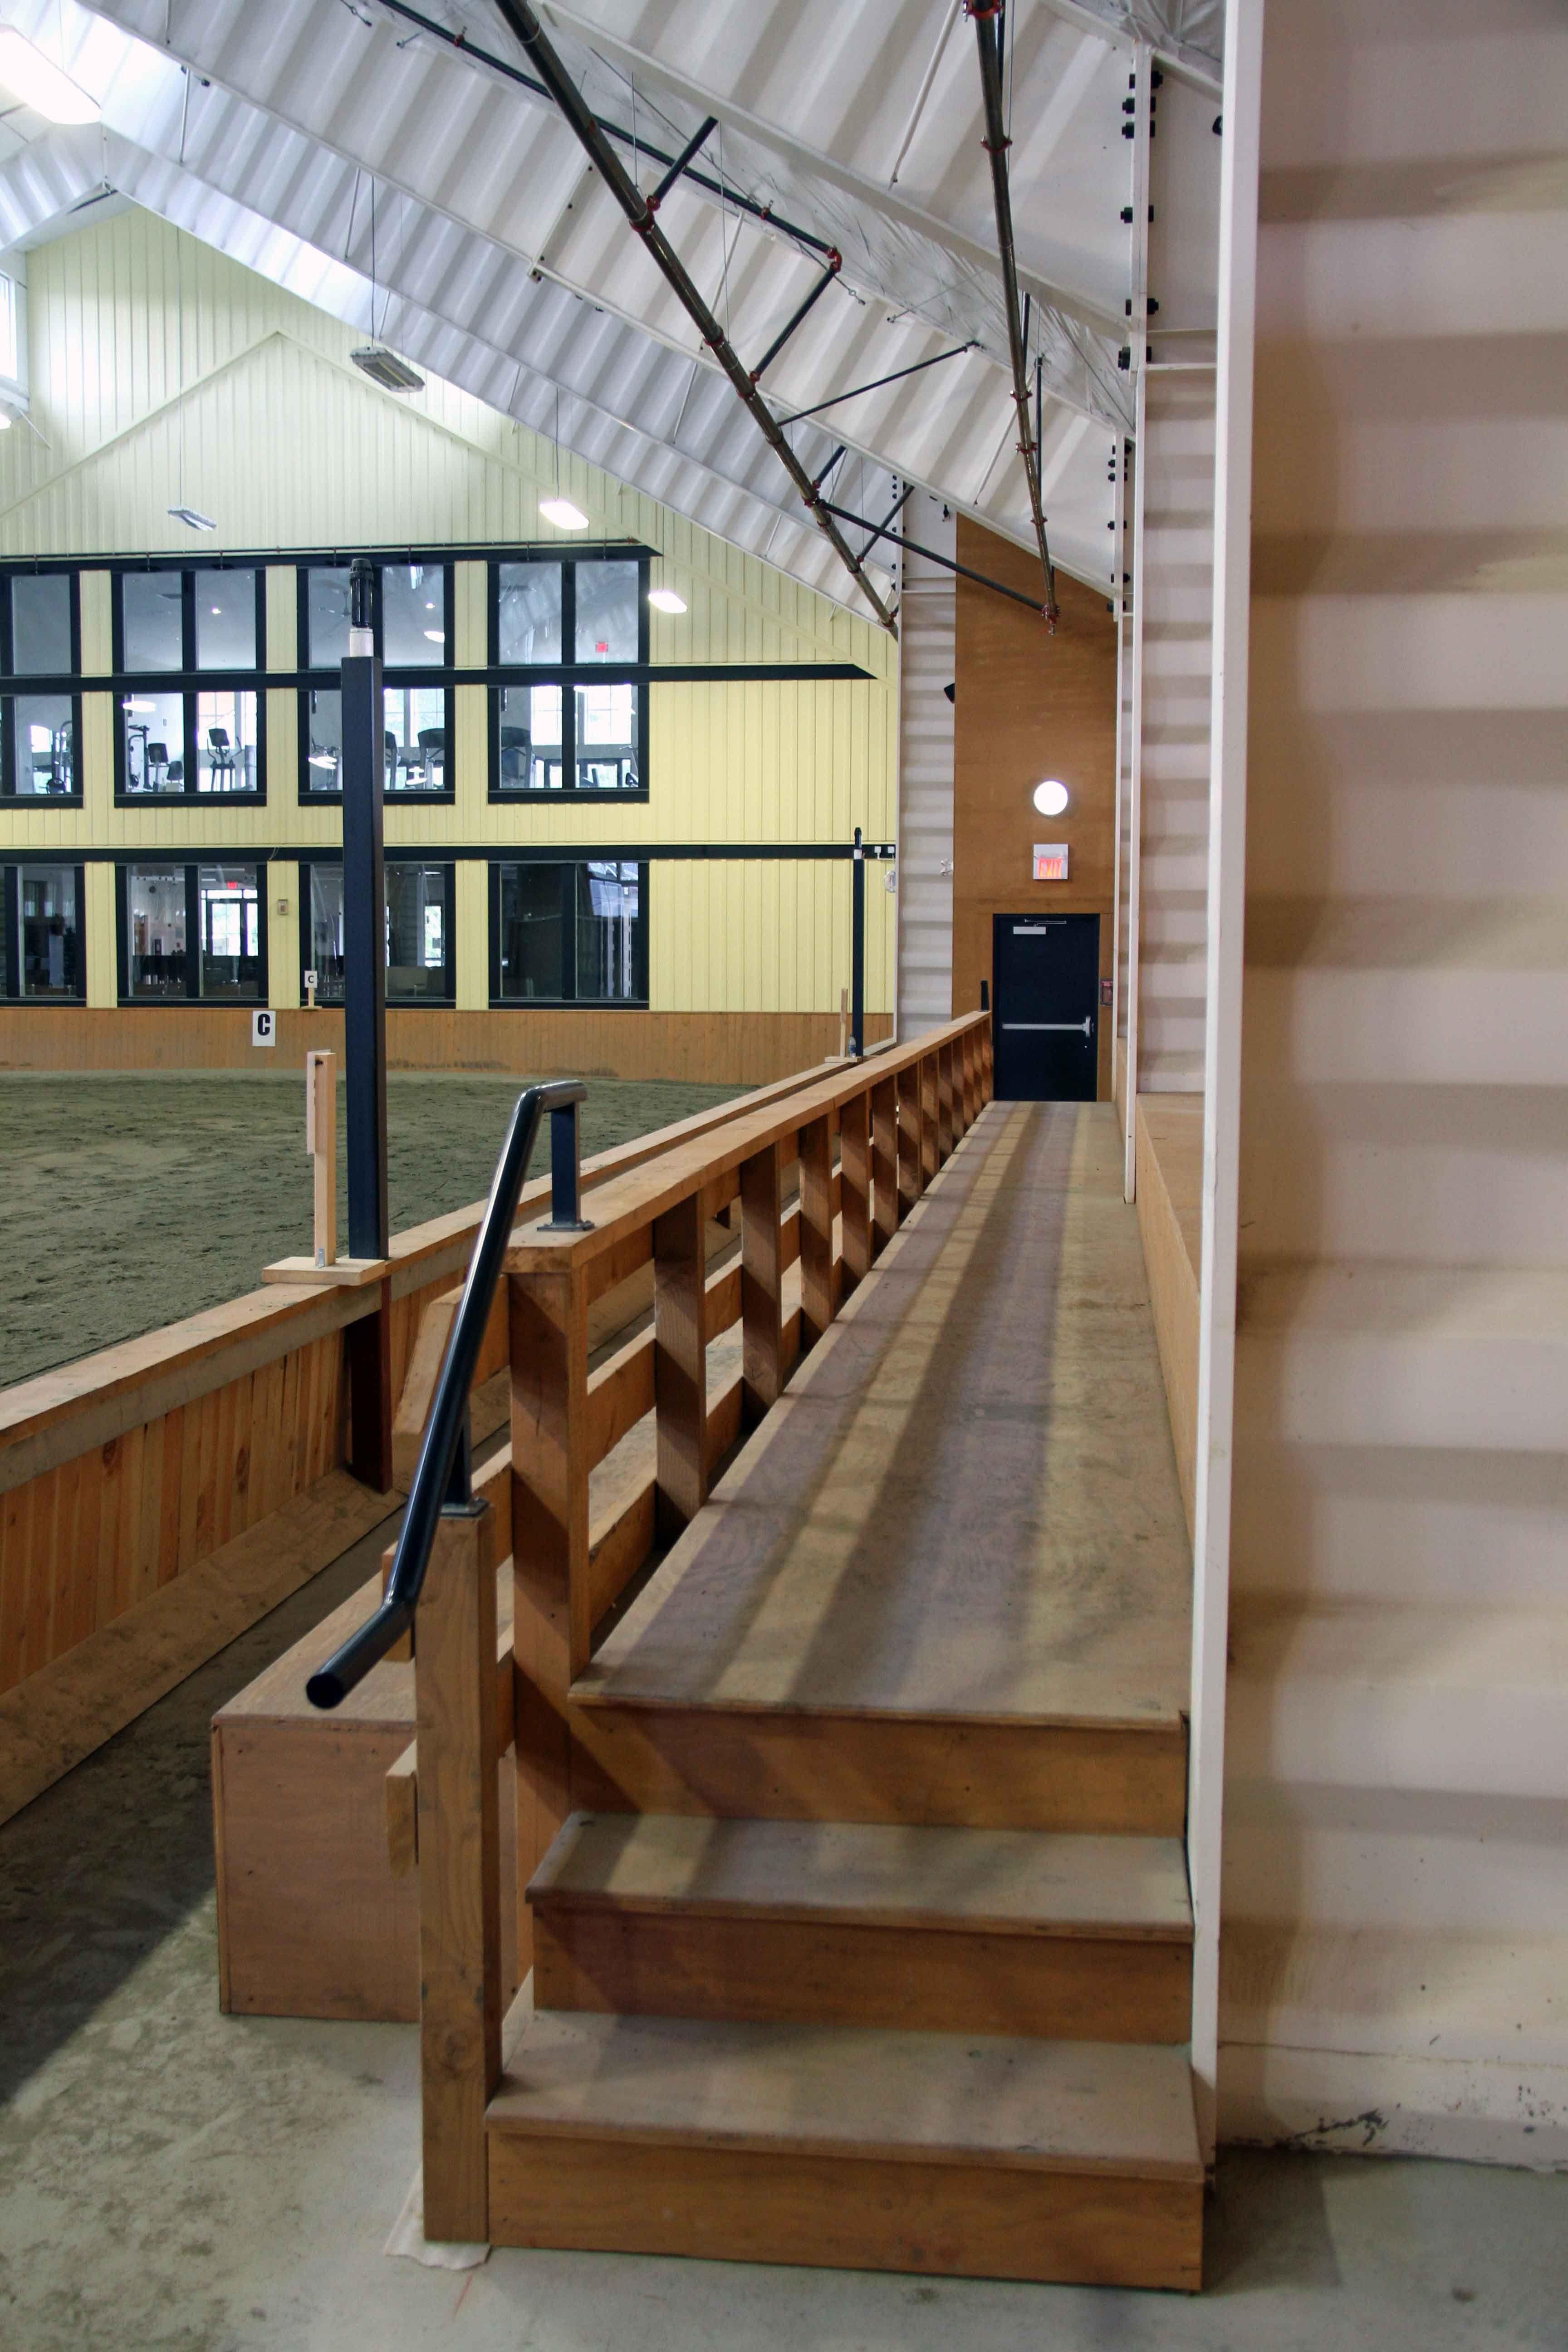 High Point Indoor Arena Viewing Area Dream Horse Barns Indoor Arena Dream Barn